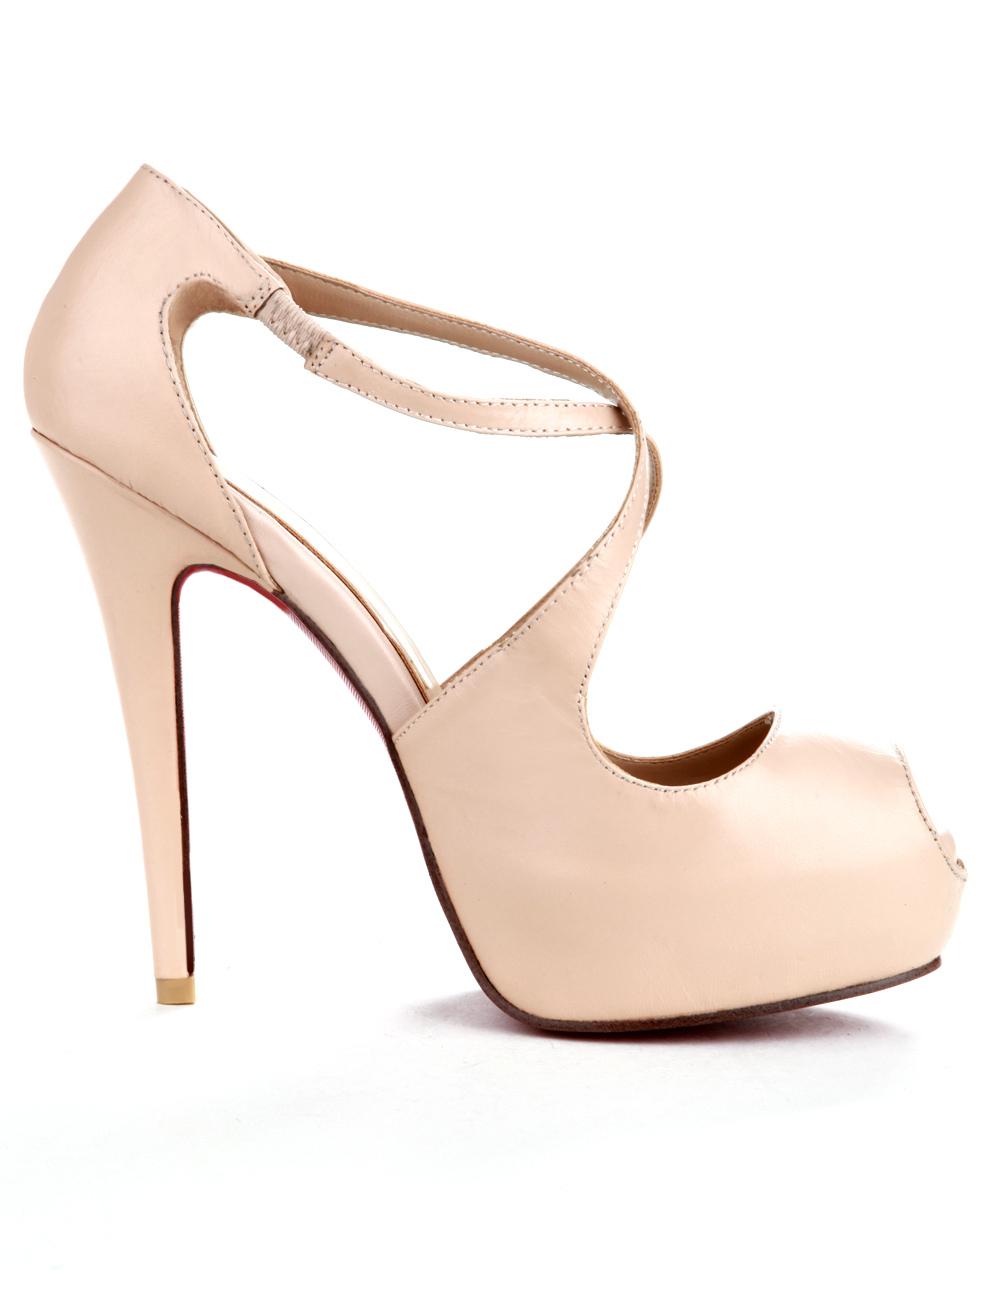 Nude Color Criss-Cross PU Peep Toe Womens Dress Sandals